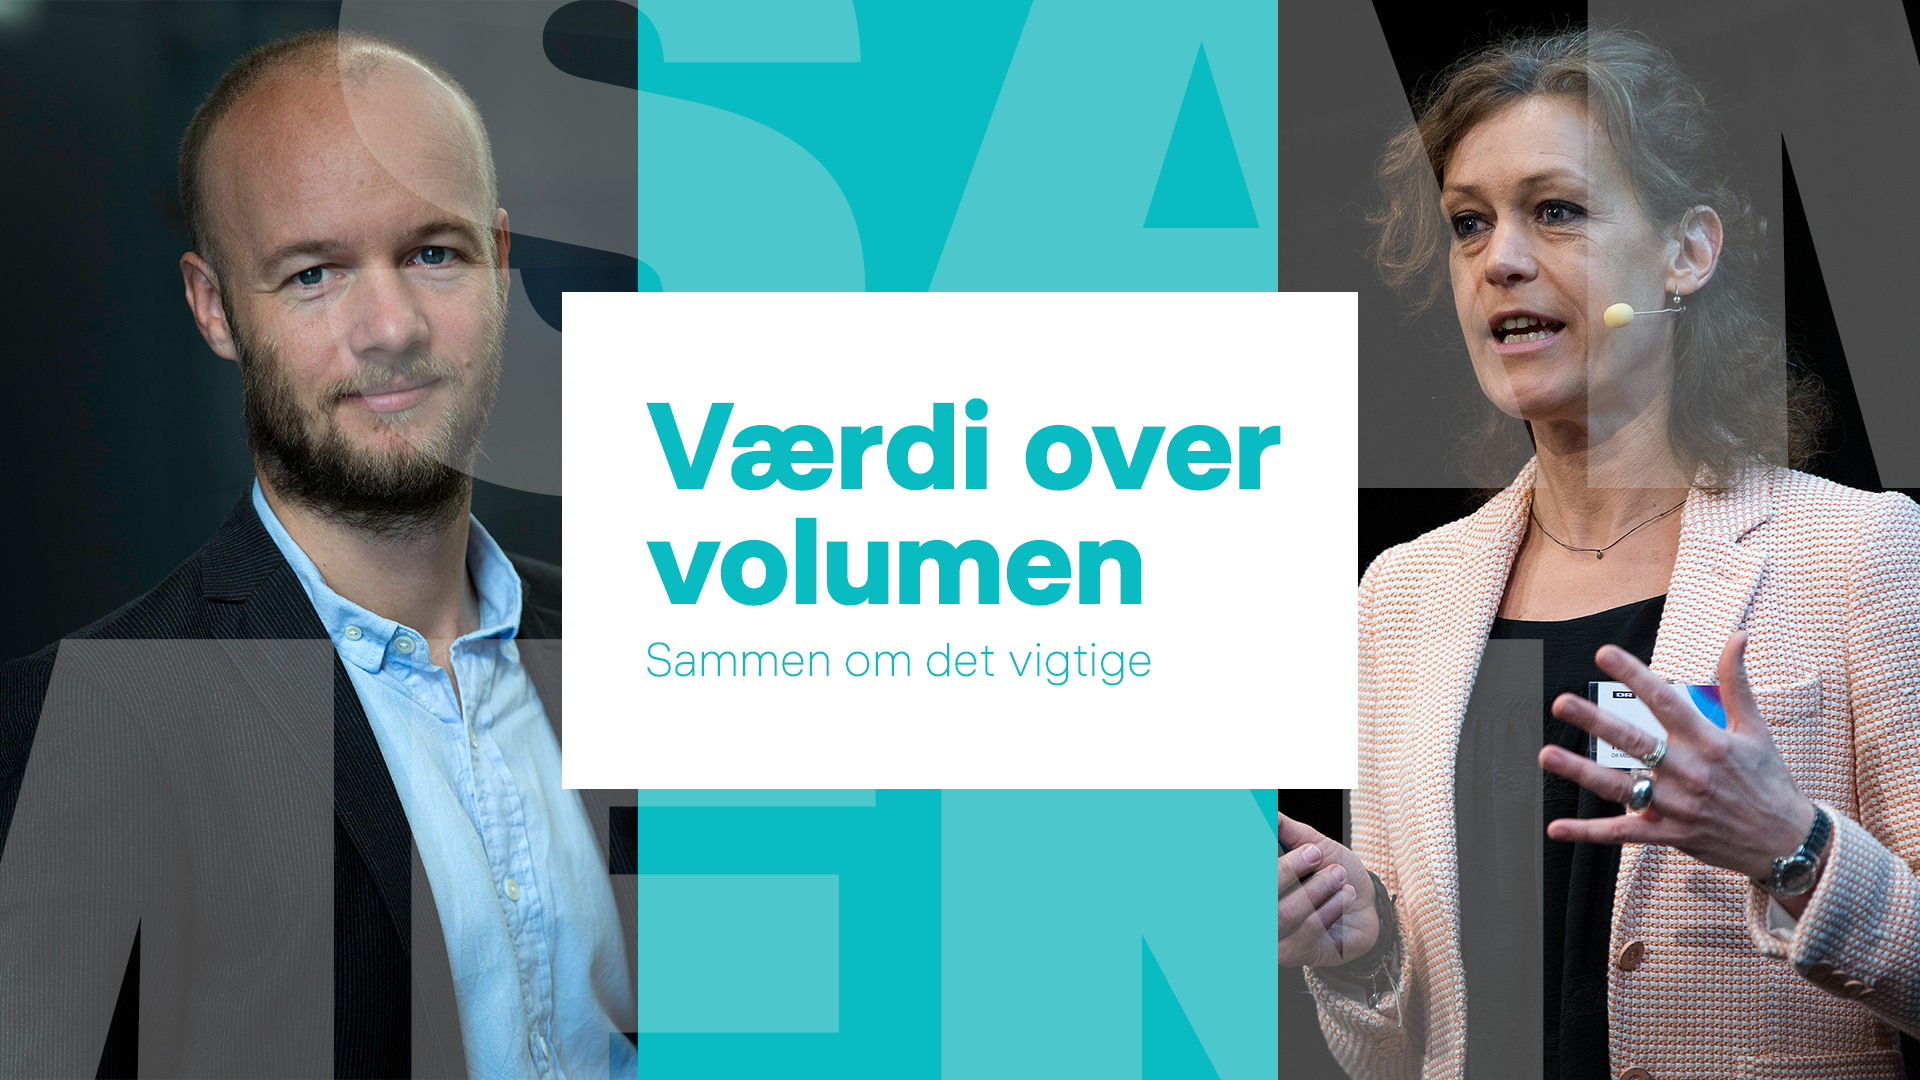 vaerdi_over_volumen_foto.png